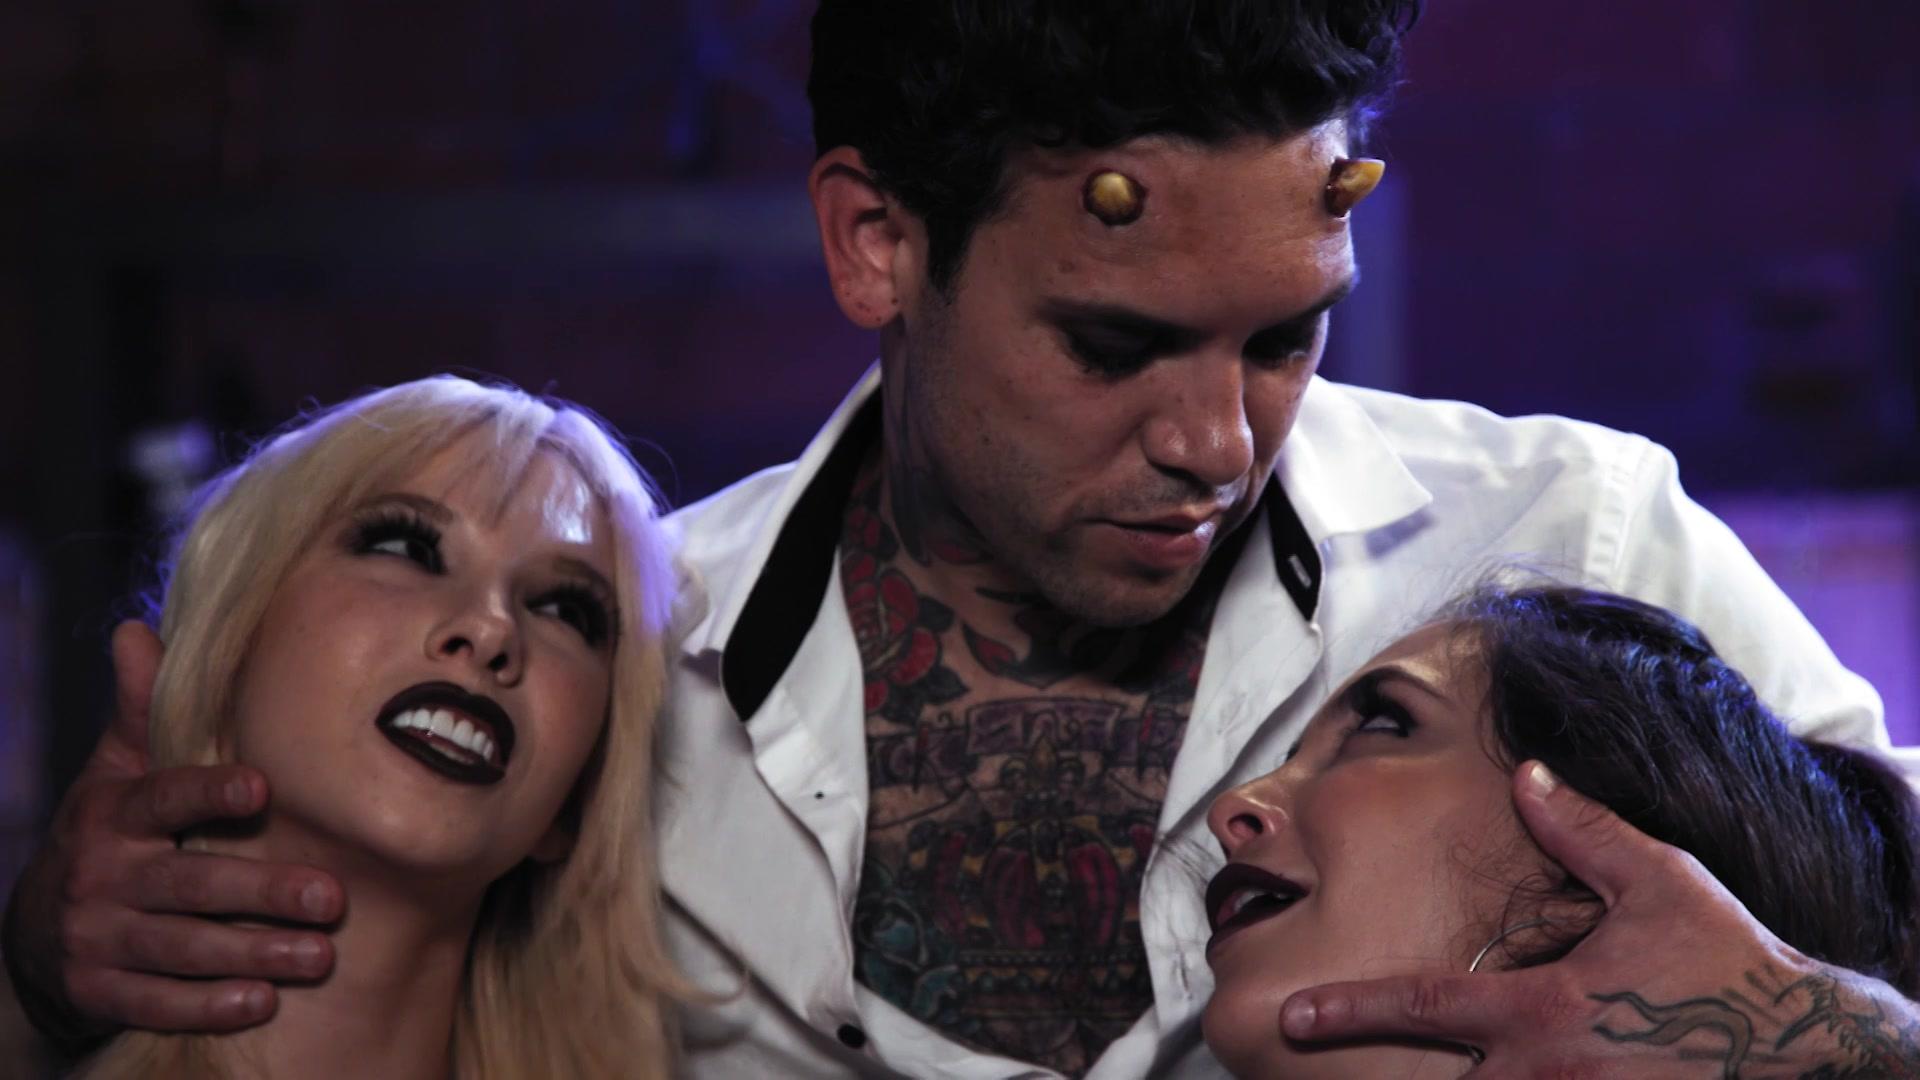 3 Cheers For Satan (2019) Film Erotic Online in HD 1080p